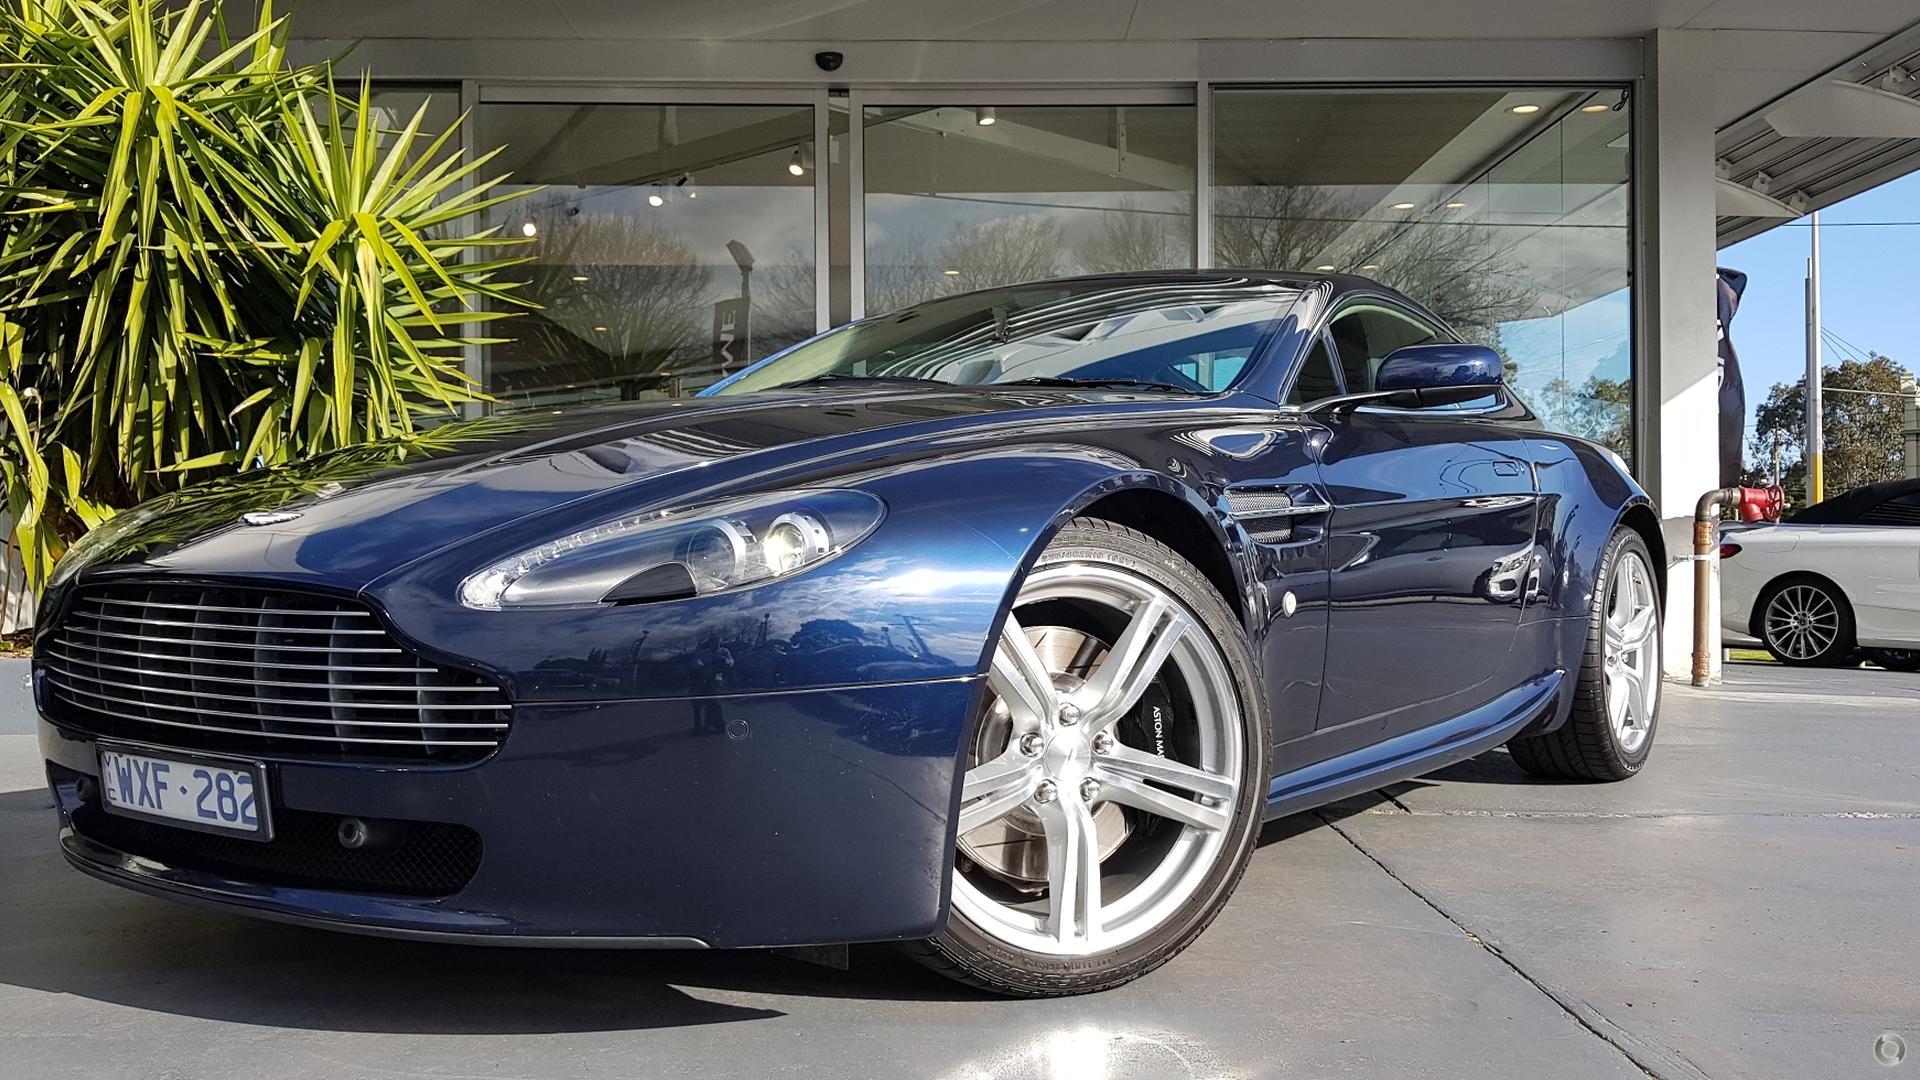 2009 Aston Martin V8 (No Series)